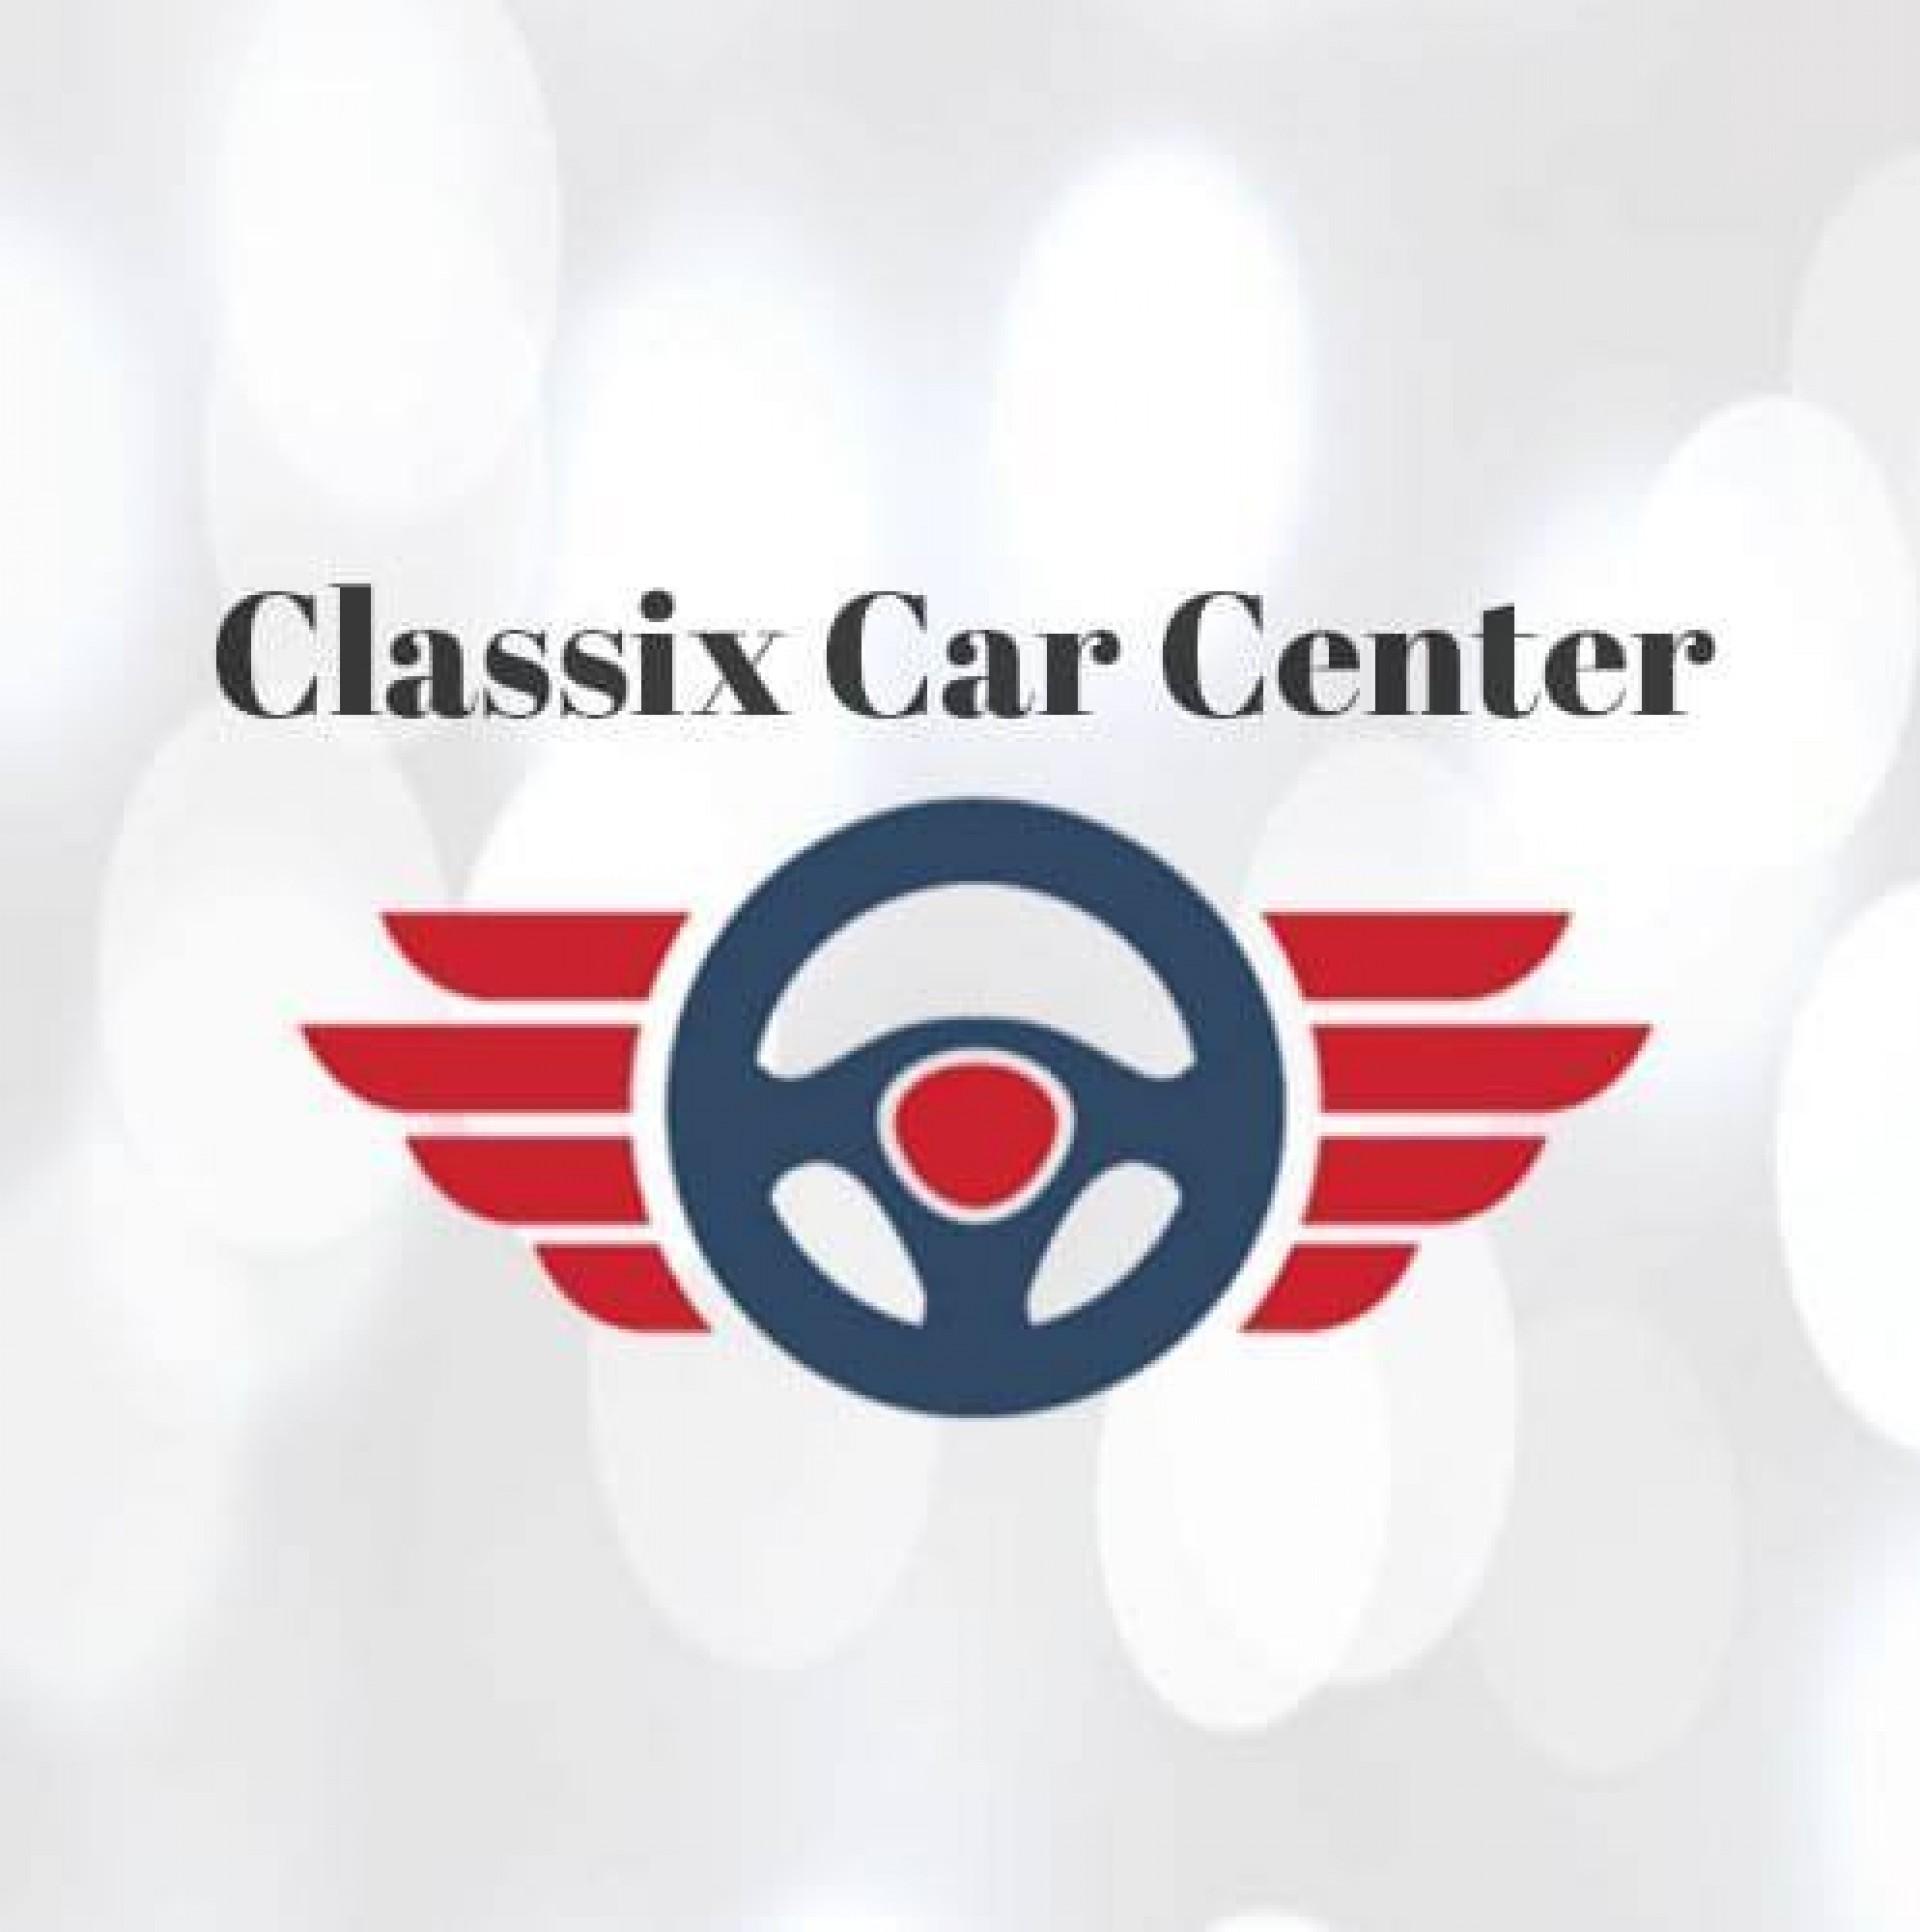 Classix car center